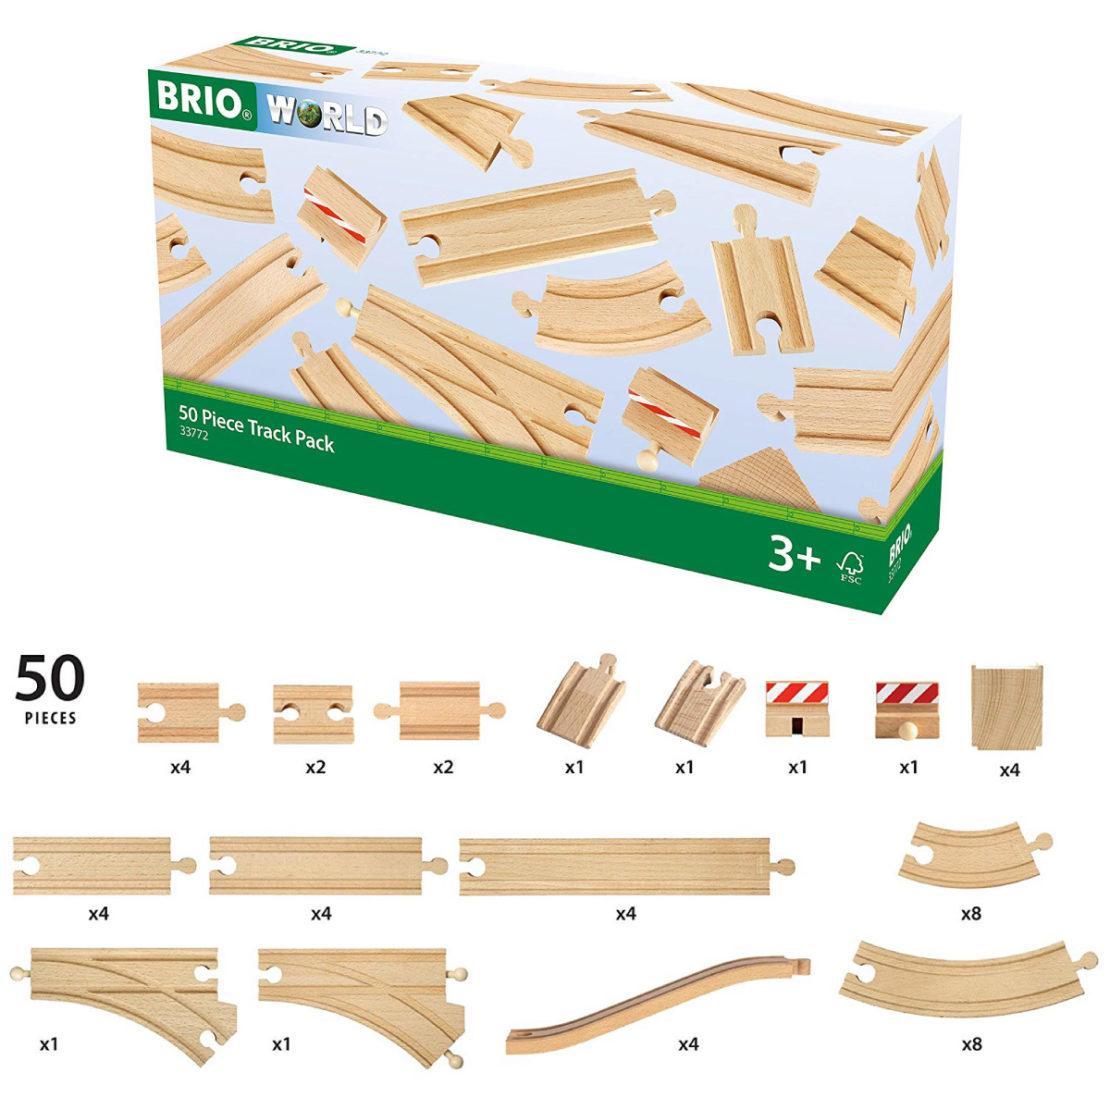 Brio 50 Piece Expansion Track Set